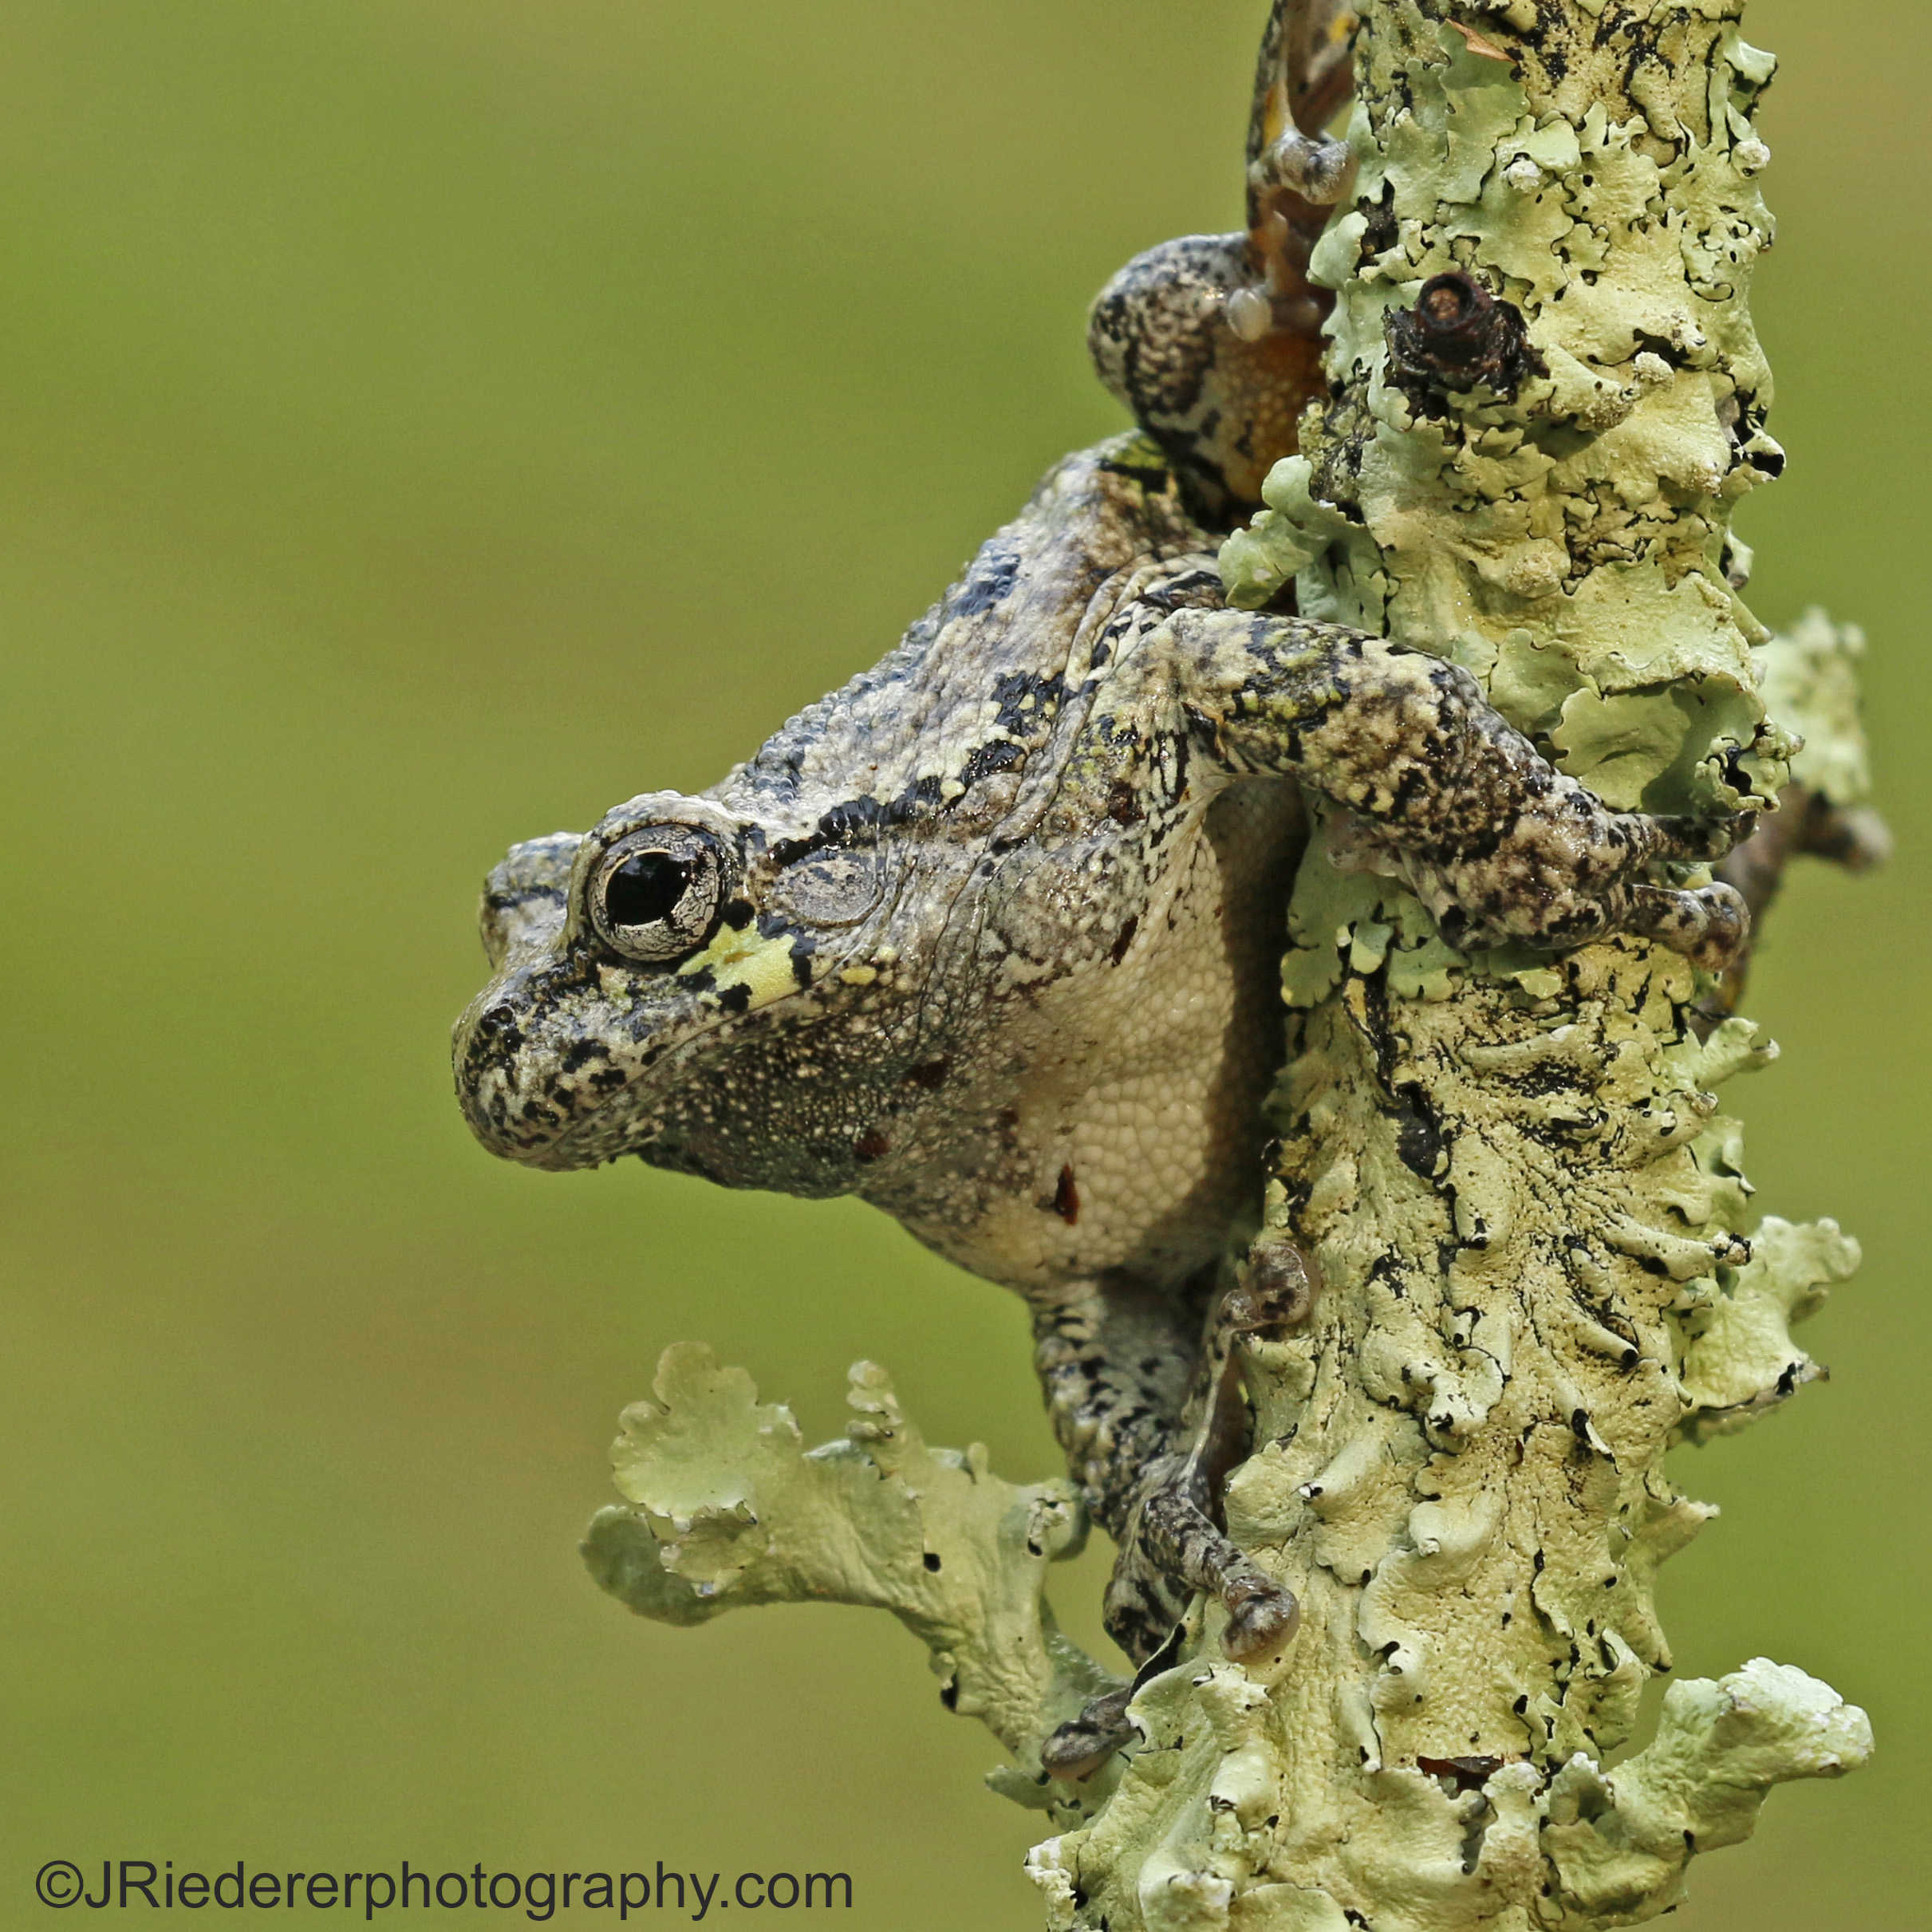 Grey Treefrog Cuteness!